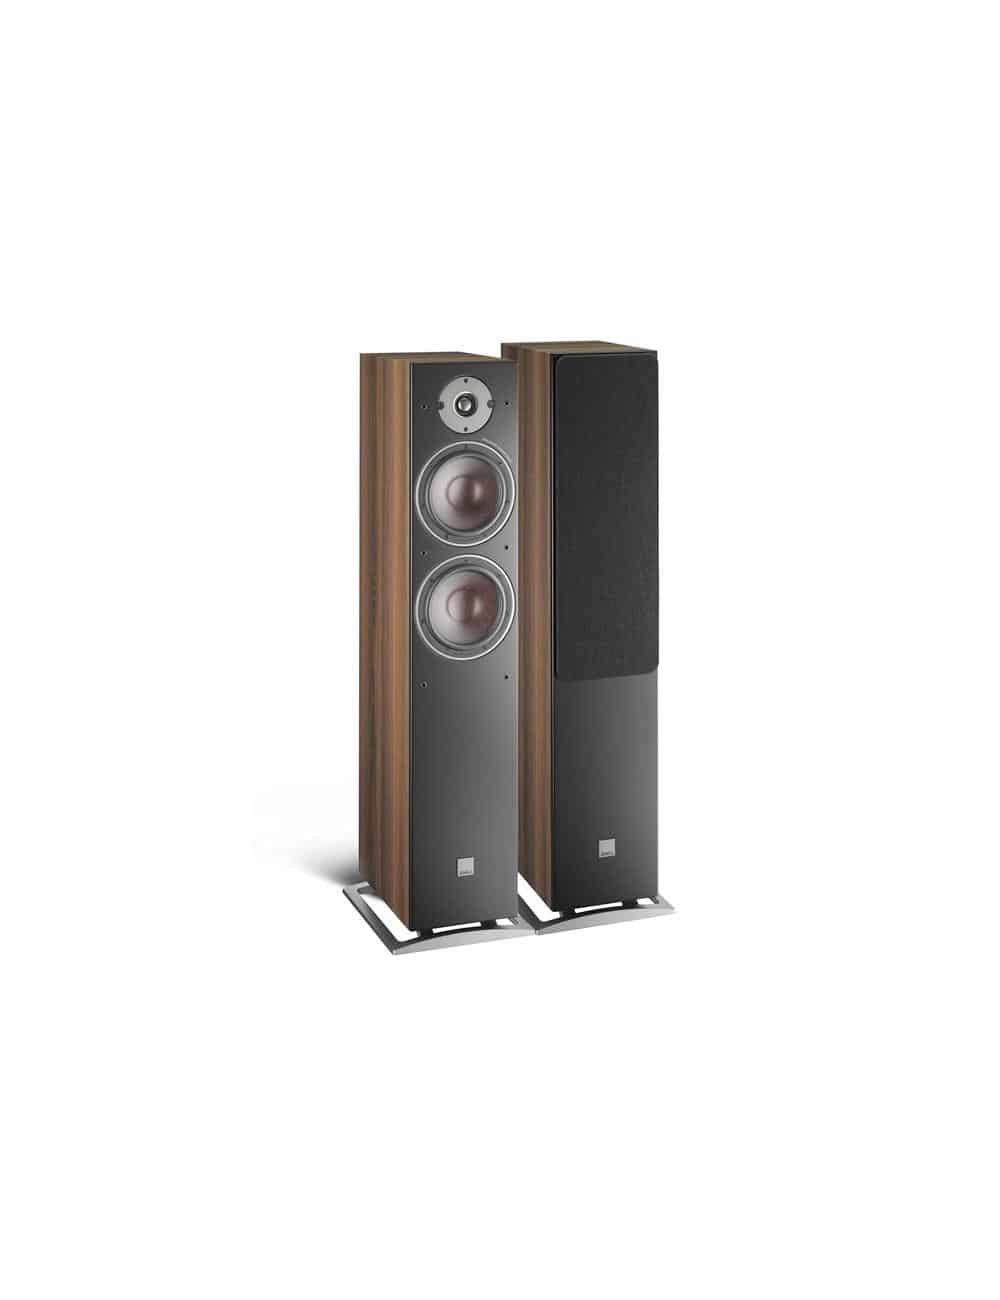 diffusori acustici da pavimento Dali Oberon 7 per HiFi e Home Cinema, finitura walnut